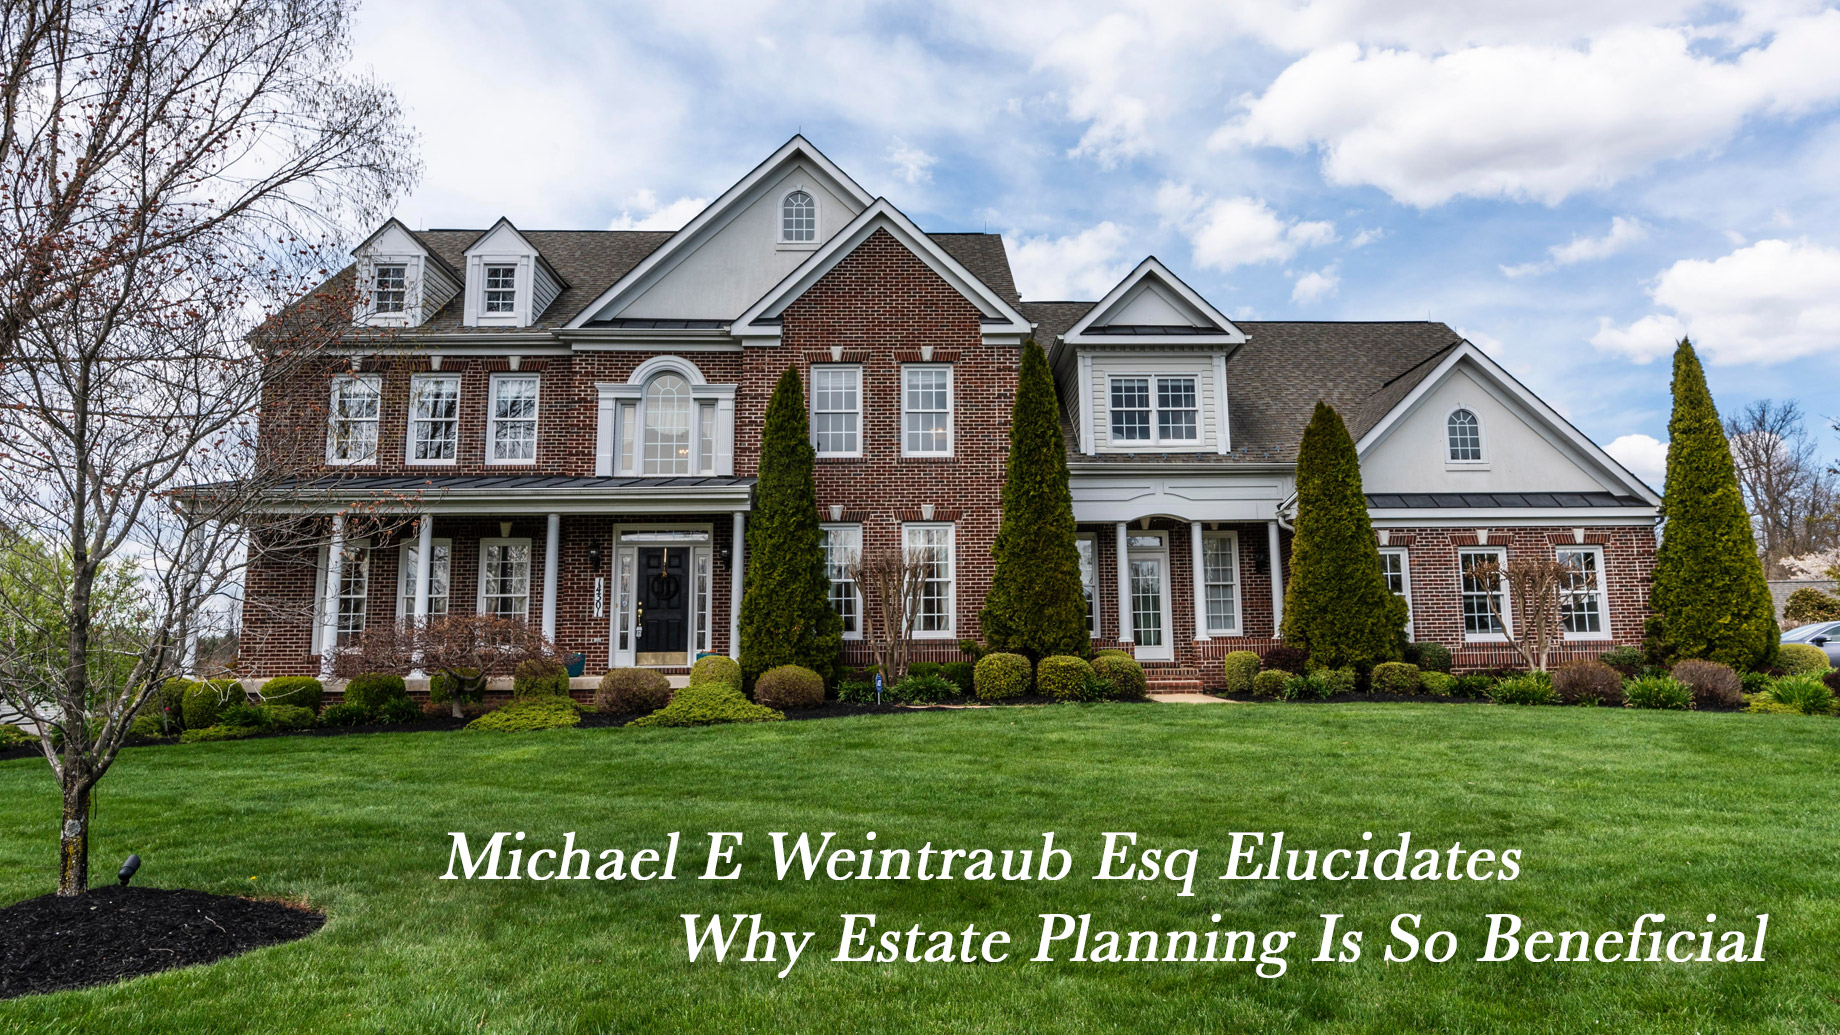 Michael E Weintraub Esq Elucidates Why Estate Planning Is So Beneficial